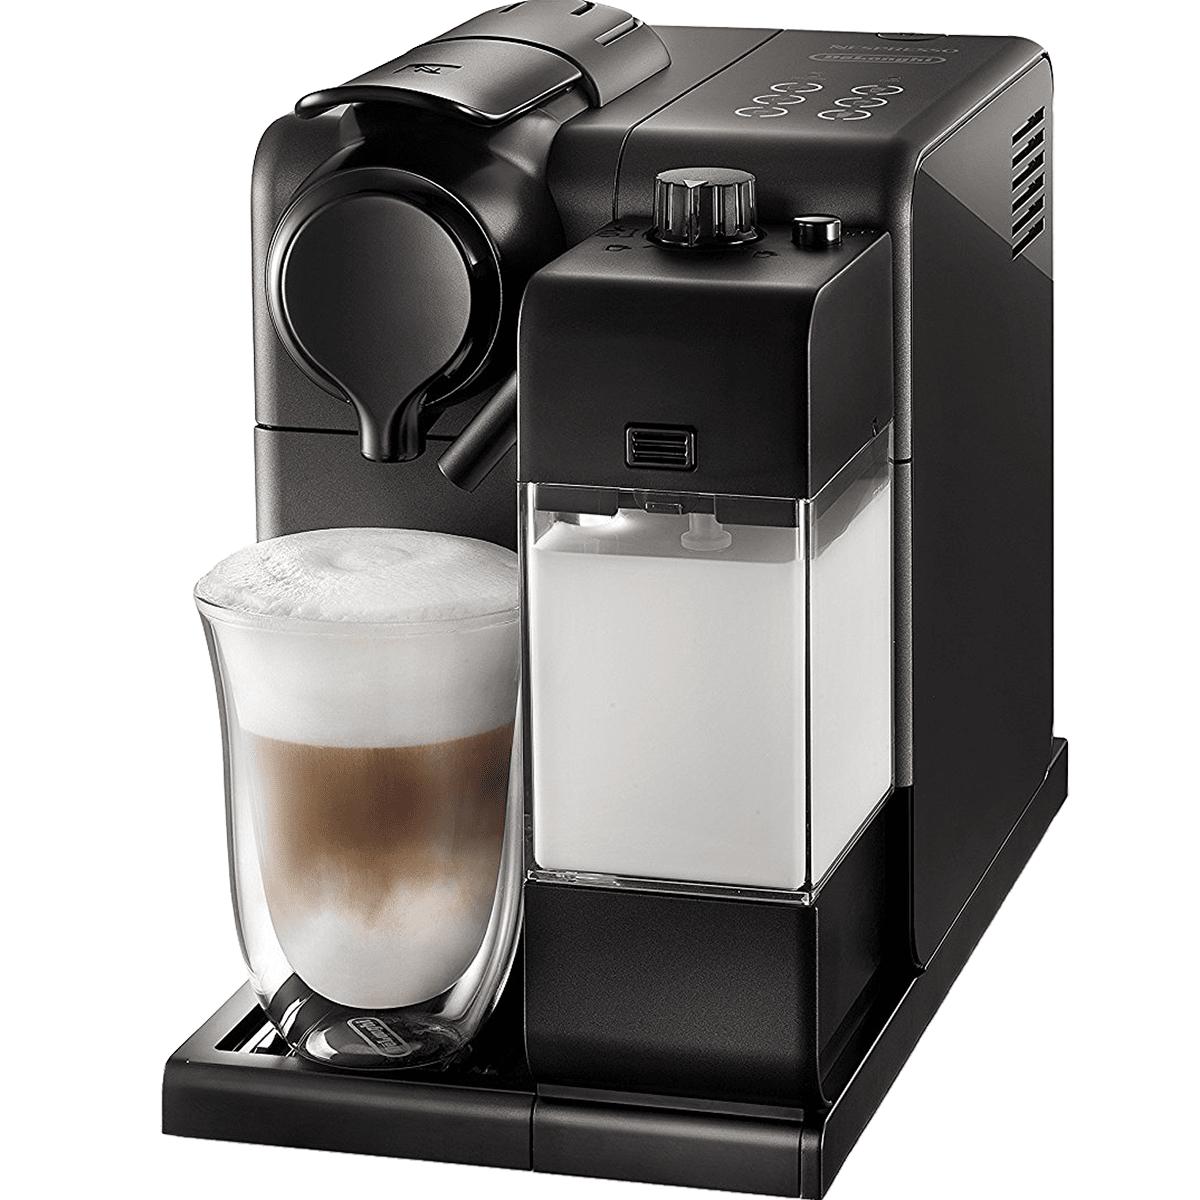 DeLonghi EN550 Lattissima Touch Espresso Machine Matte Black - EN550BK1